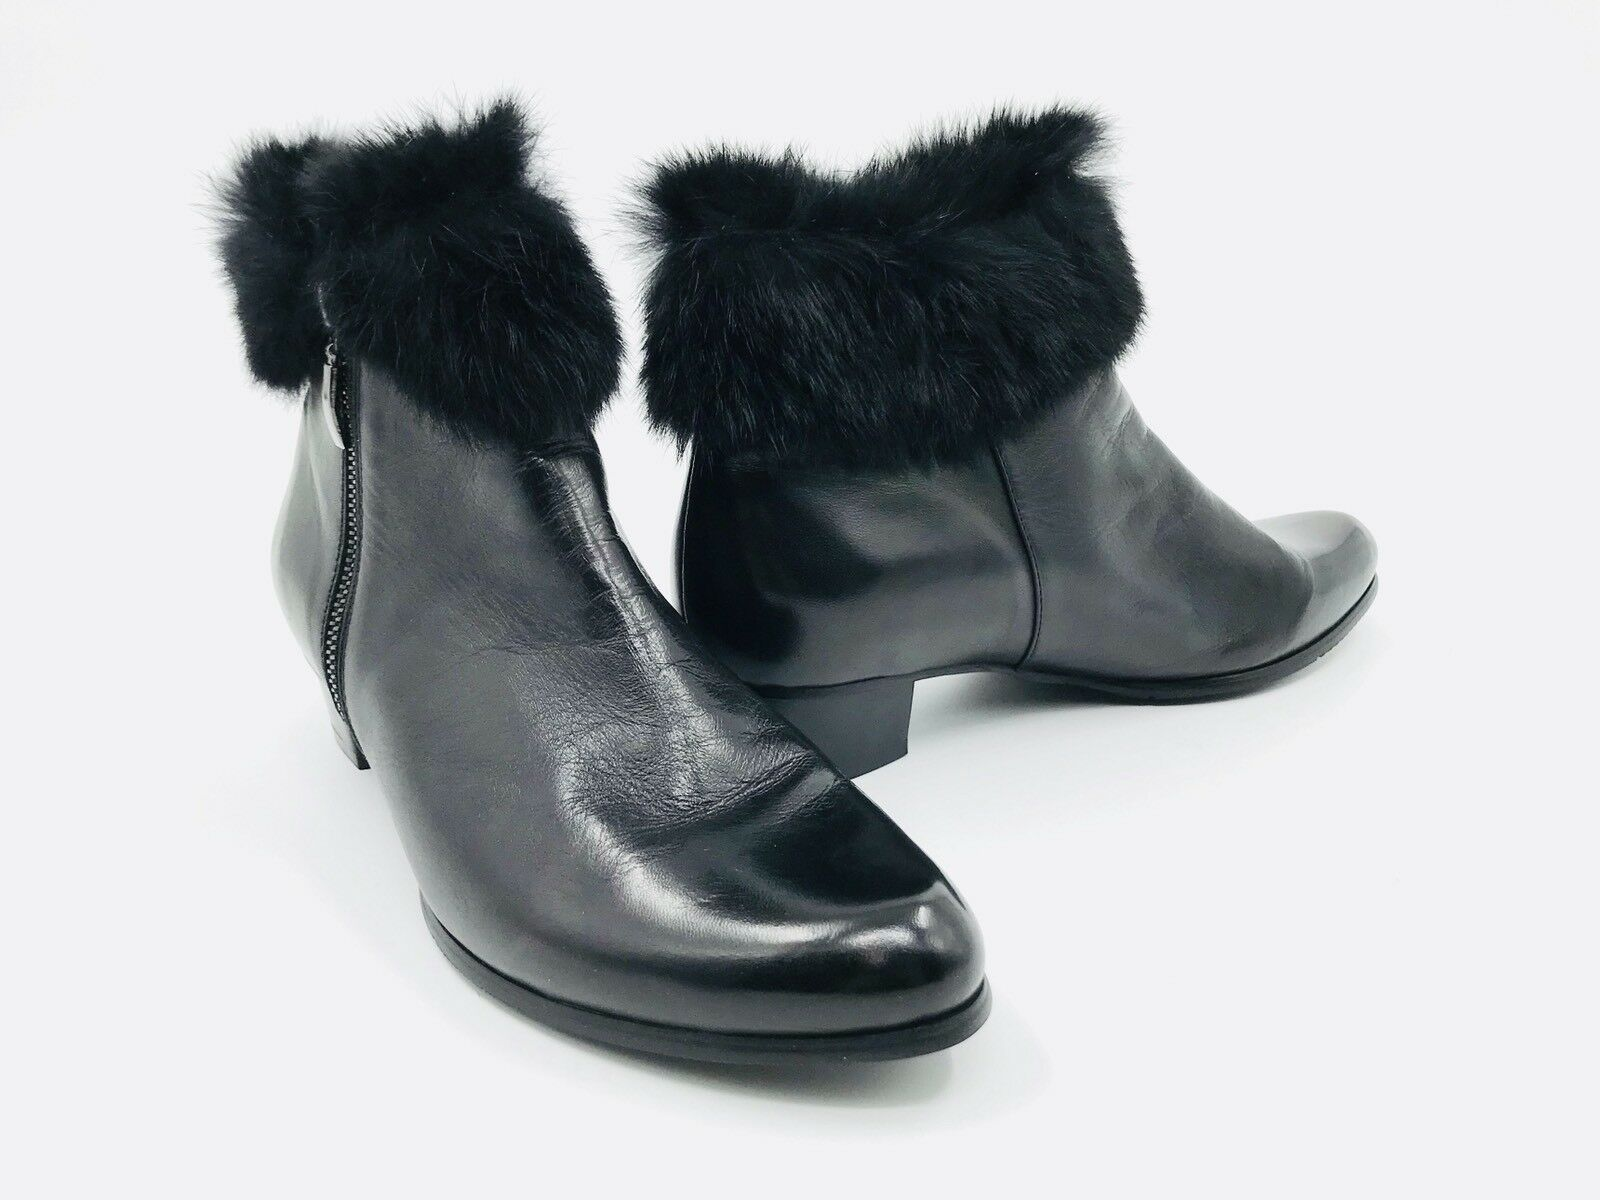 Spring Step Burnside Black Leather Bootie Women's Size 42 / 10.5-11